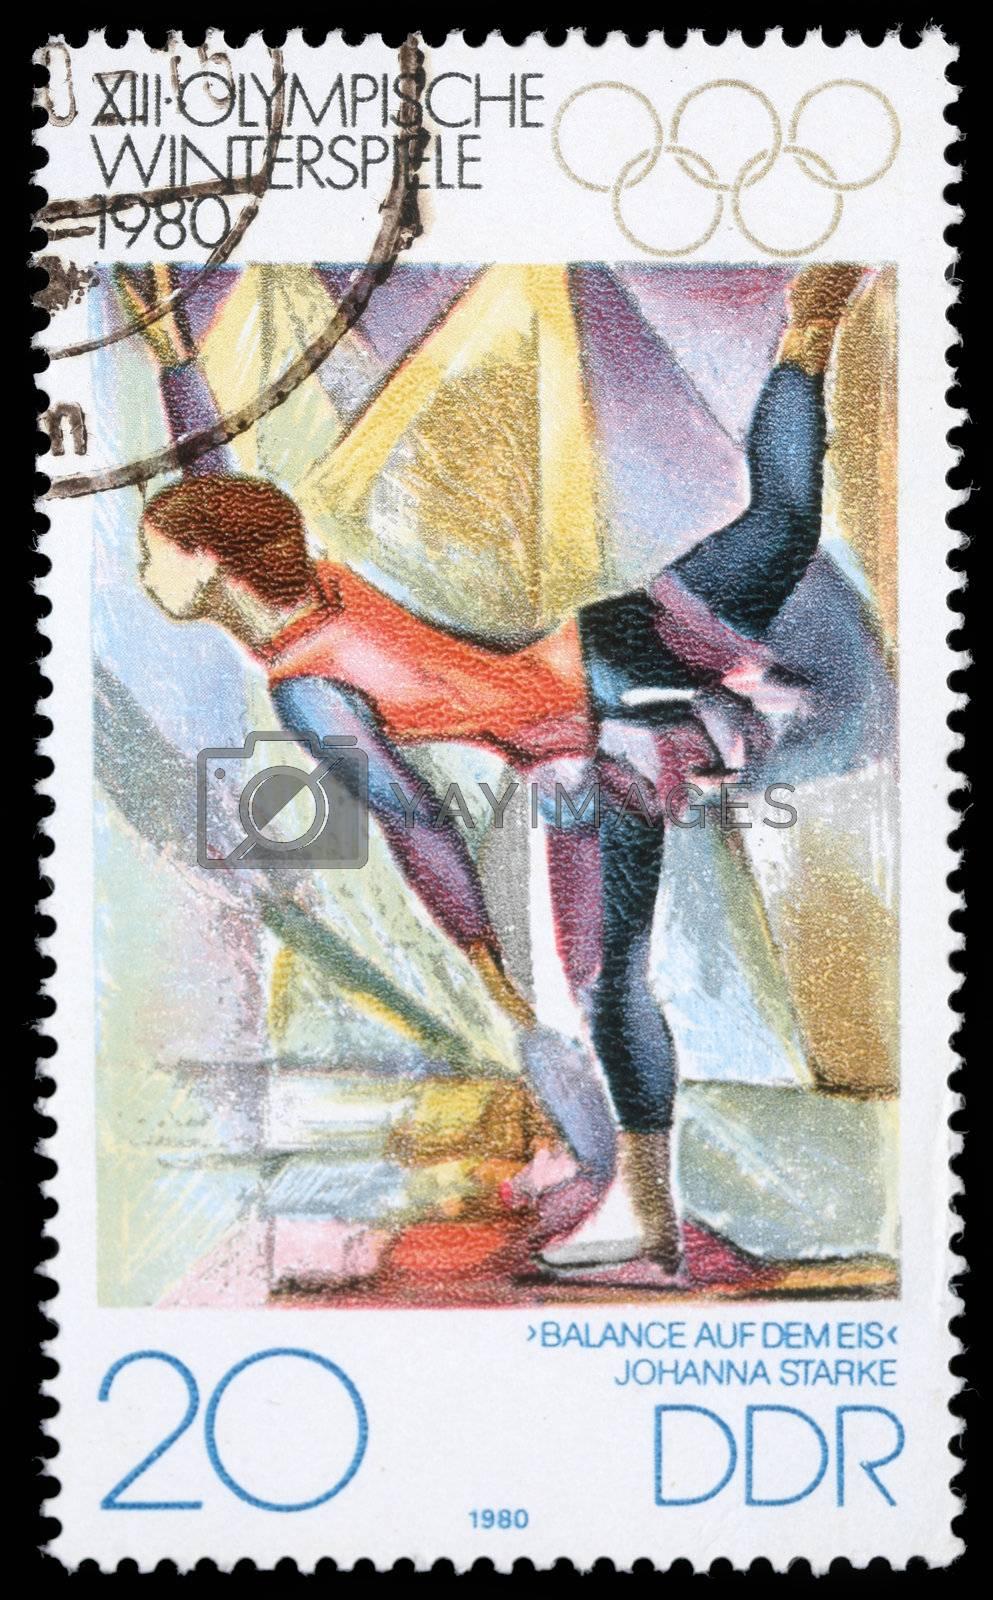 "DDR - CIRCA 1980: A stamp printed in DDR shows Johanna Starke ""Balance auf dem eis"" , from series, circa 1980"